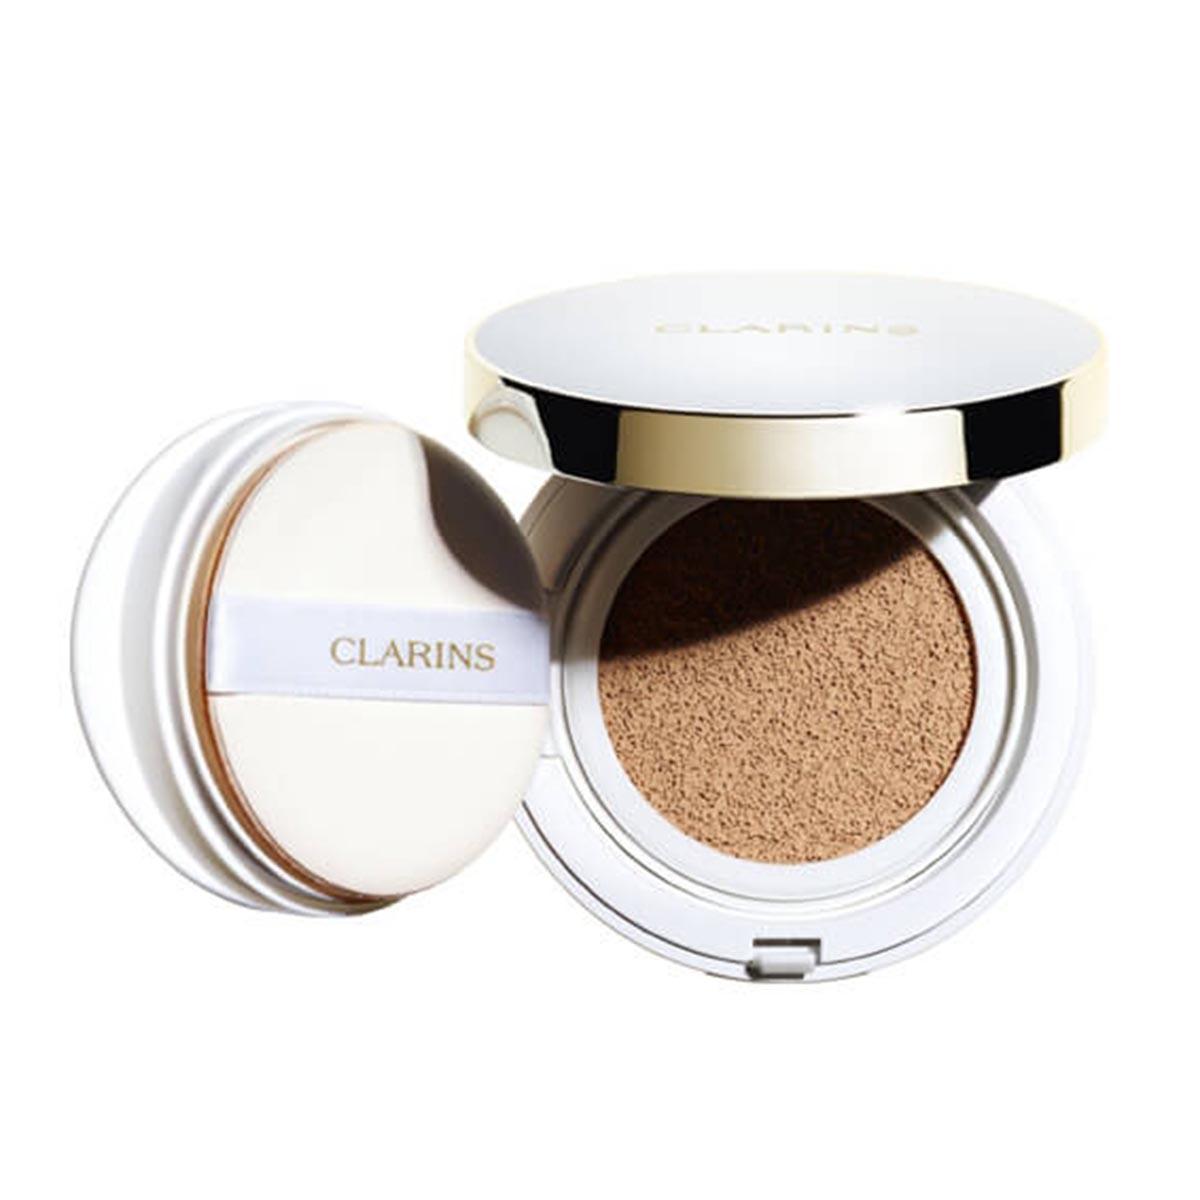 Clarins everlasting cushion base 108 sand